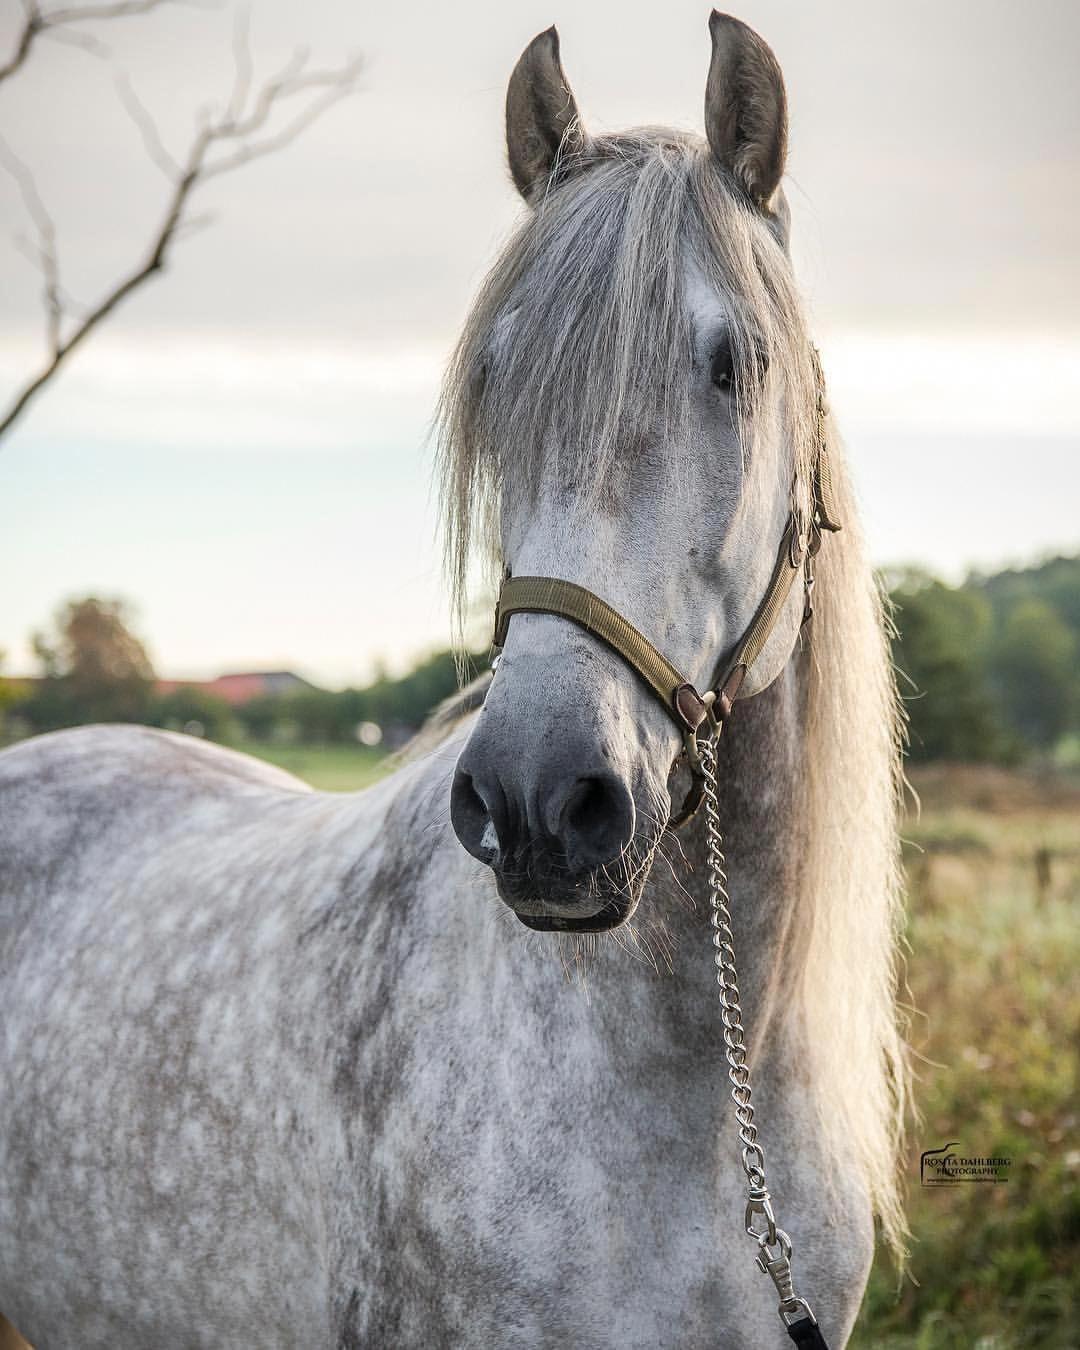 Kicked In The Head The Equestrian Helmet Horse Breeds Horses Pretty Horses